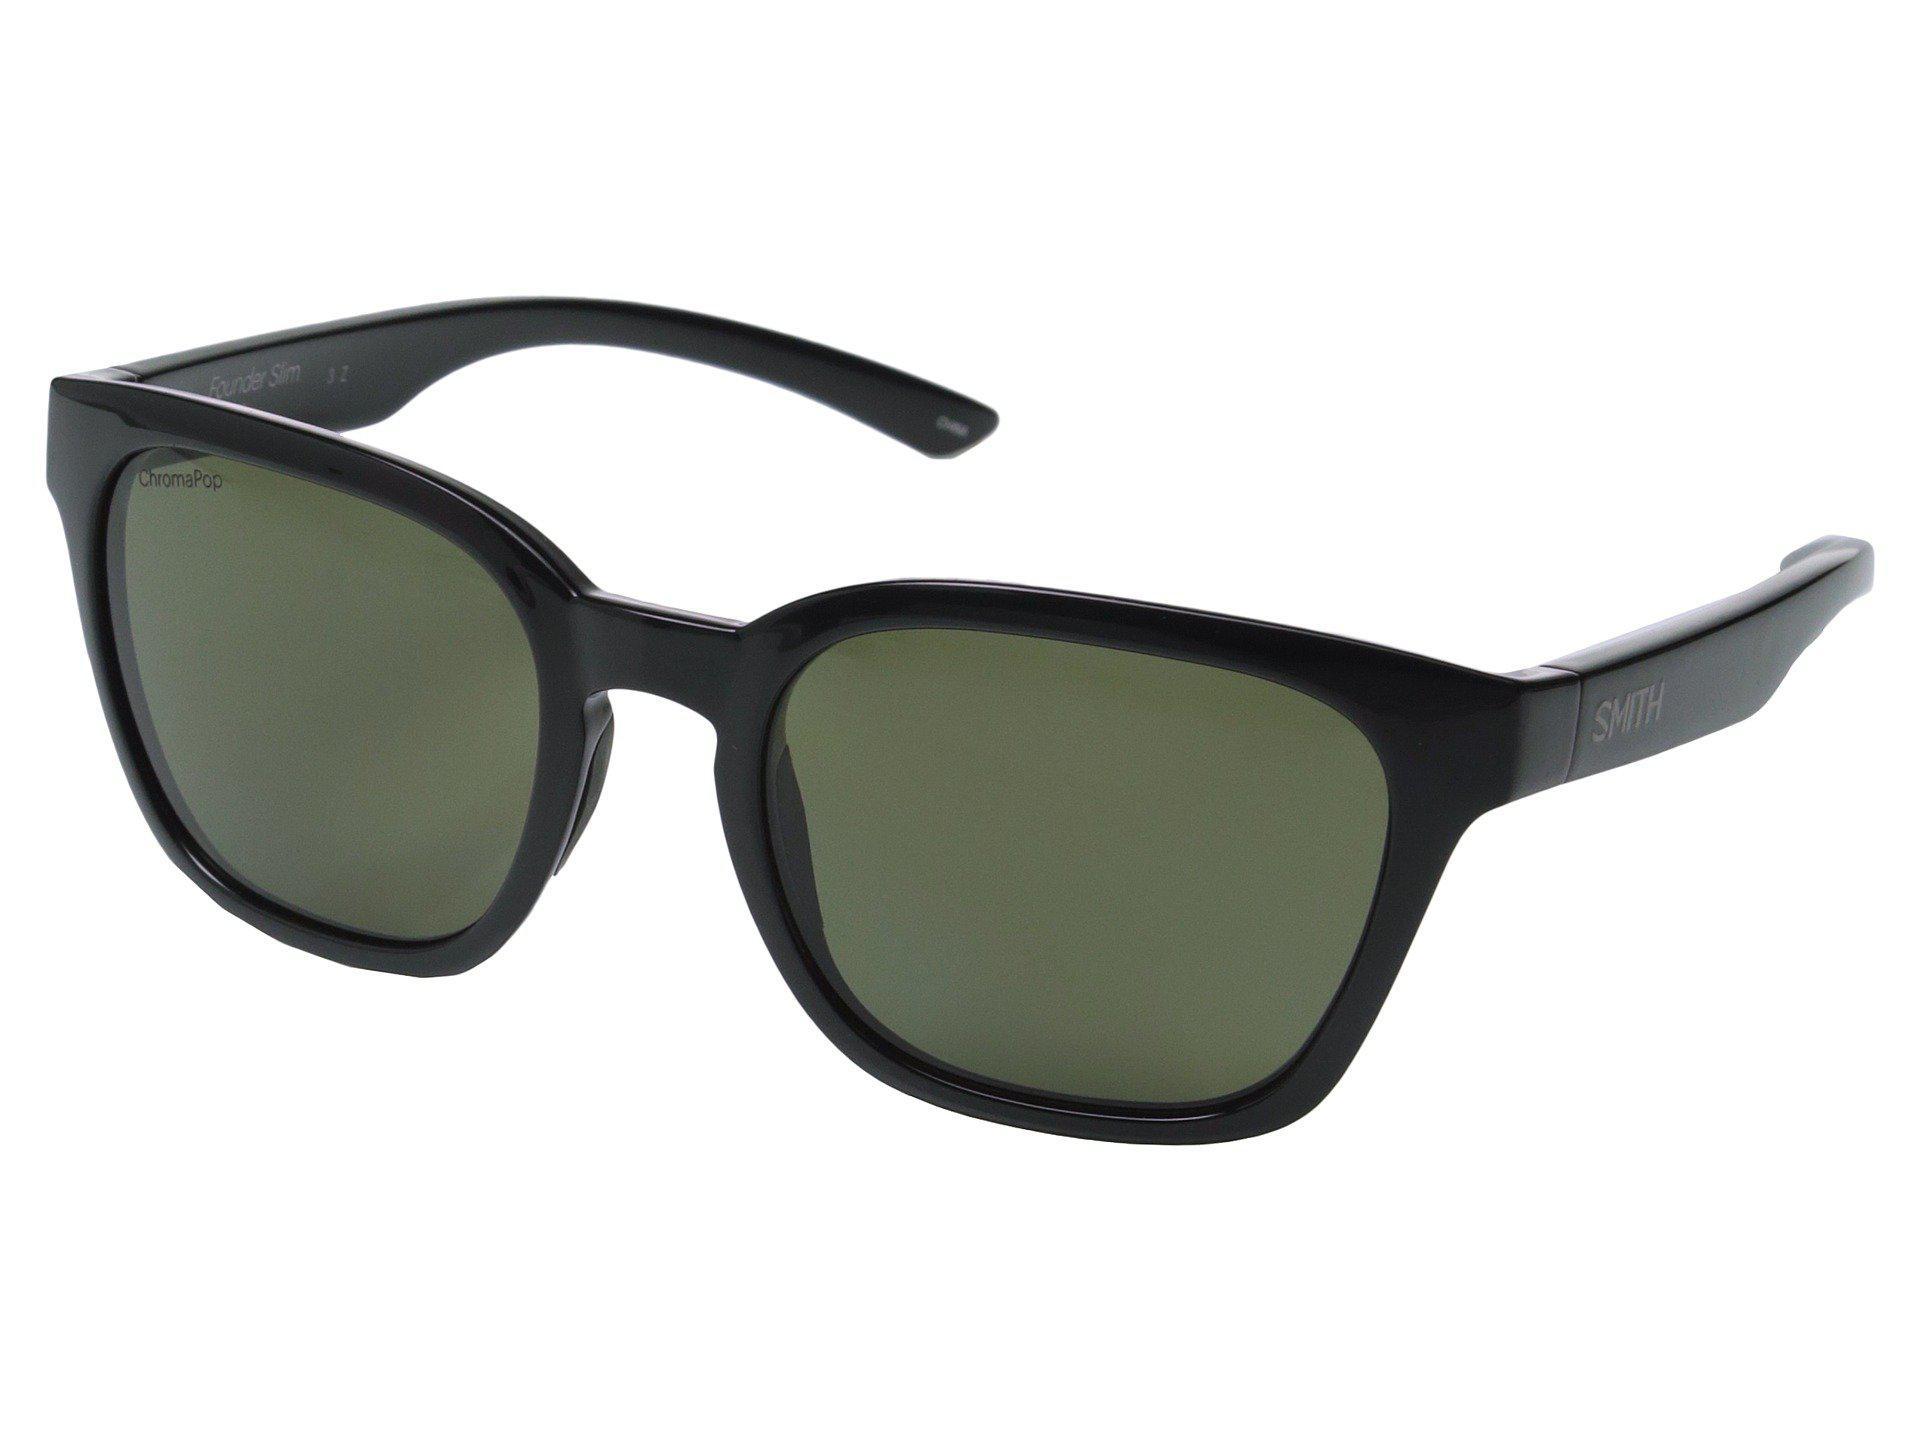 dcf50f9412a Lyst - Smith Optics Founder Slim (black polarized Gray green ...